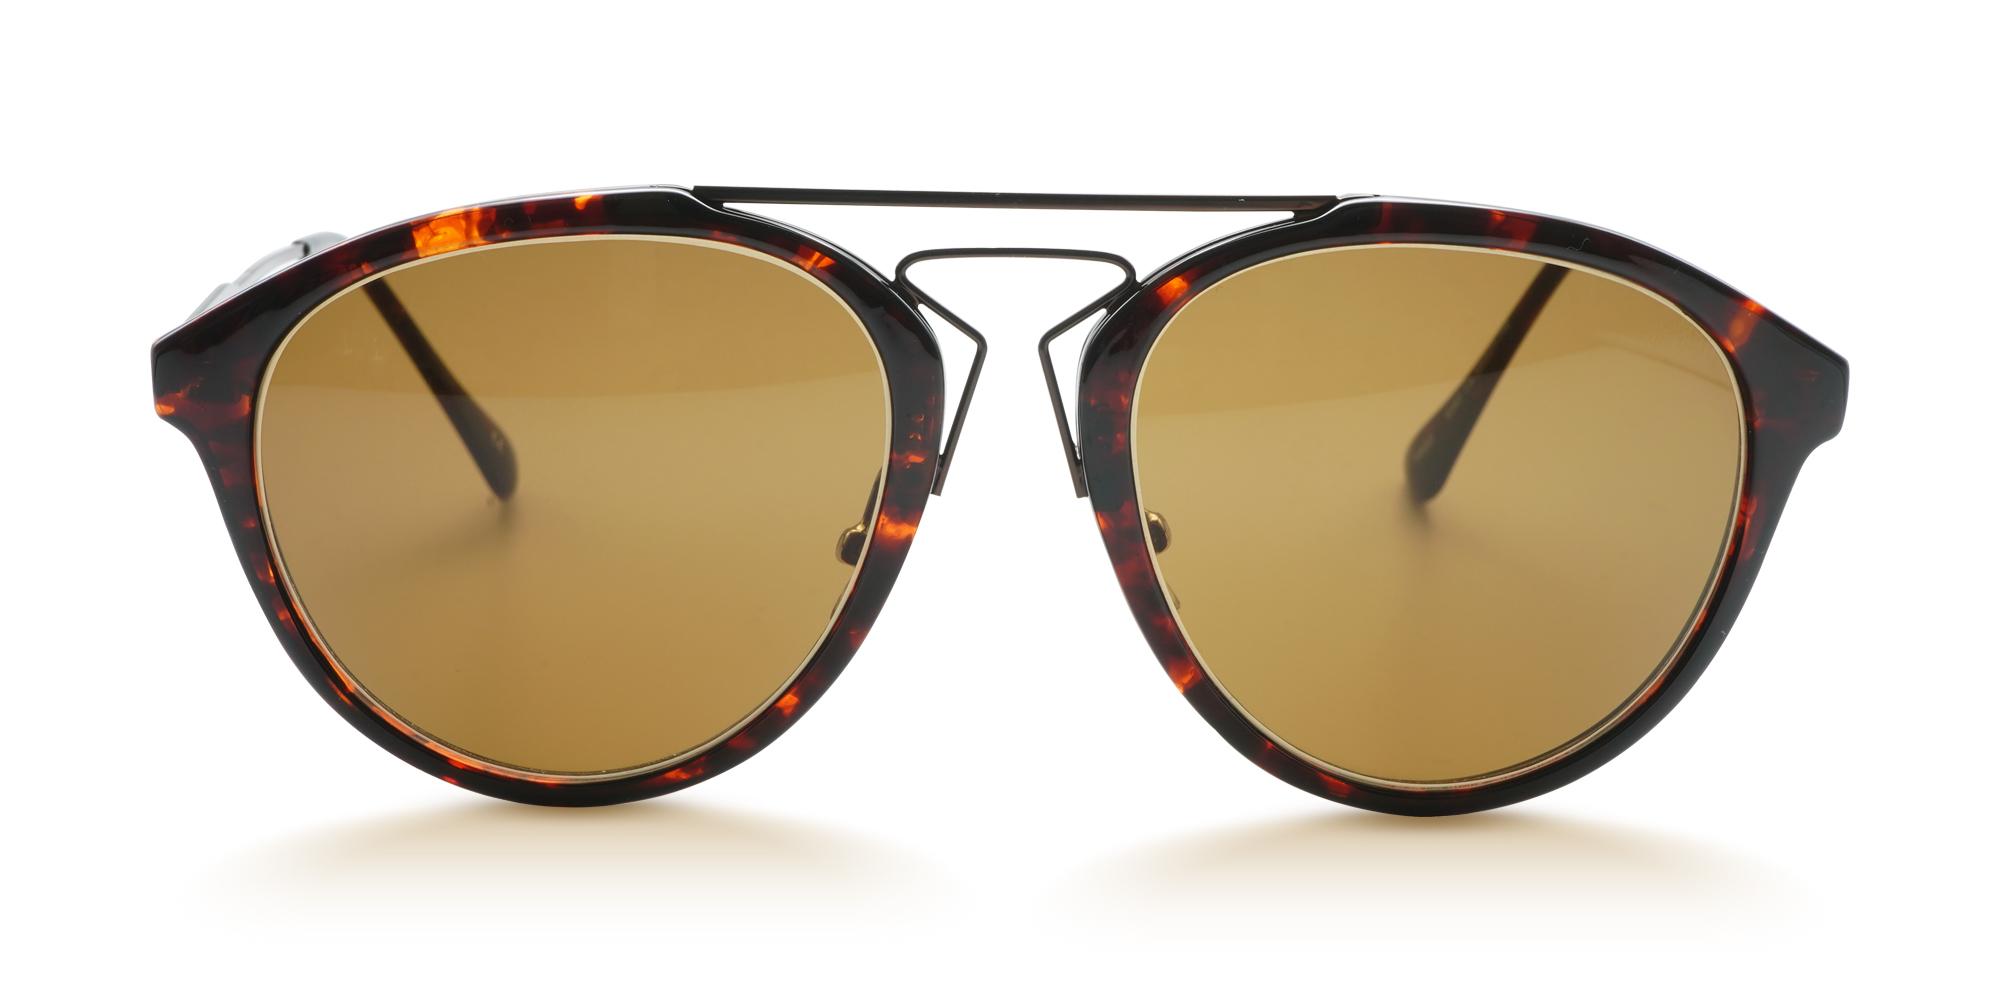 Dunkirk Sunglasses Demi - Women Prescription Sunglasses